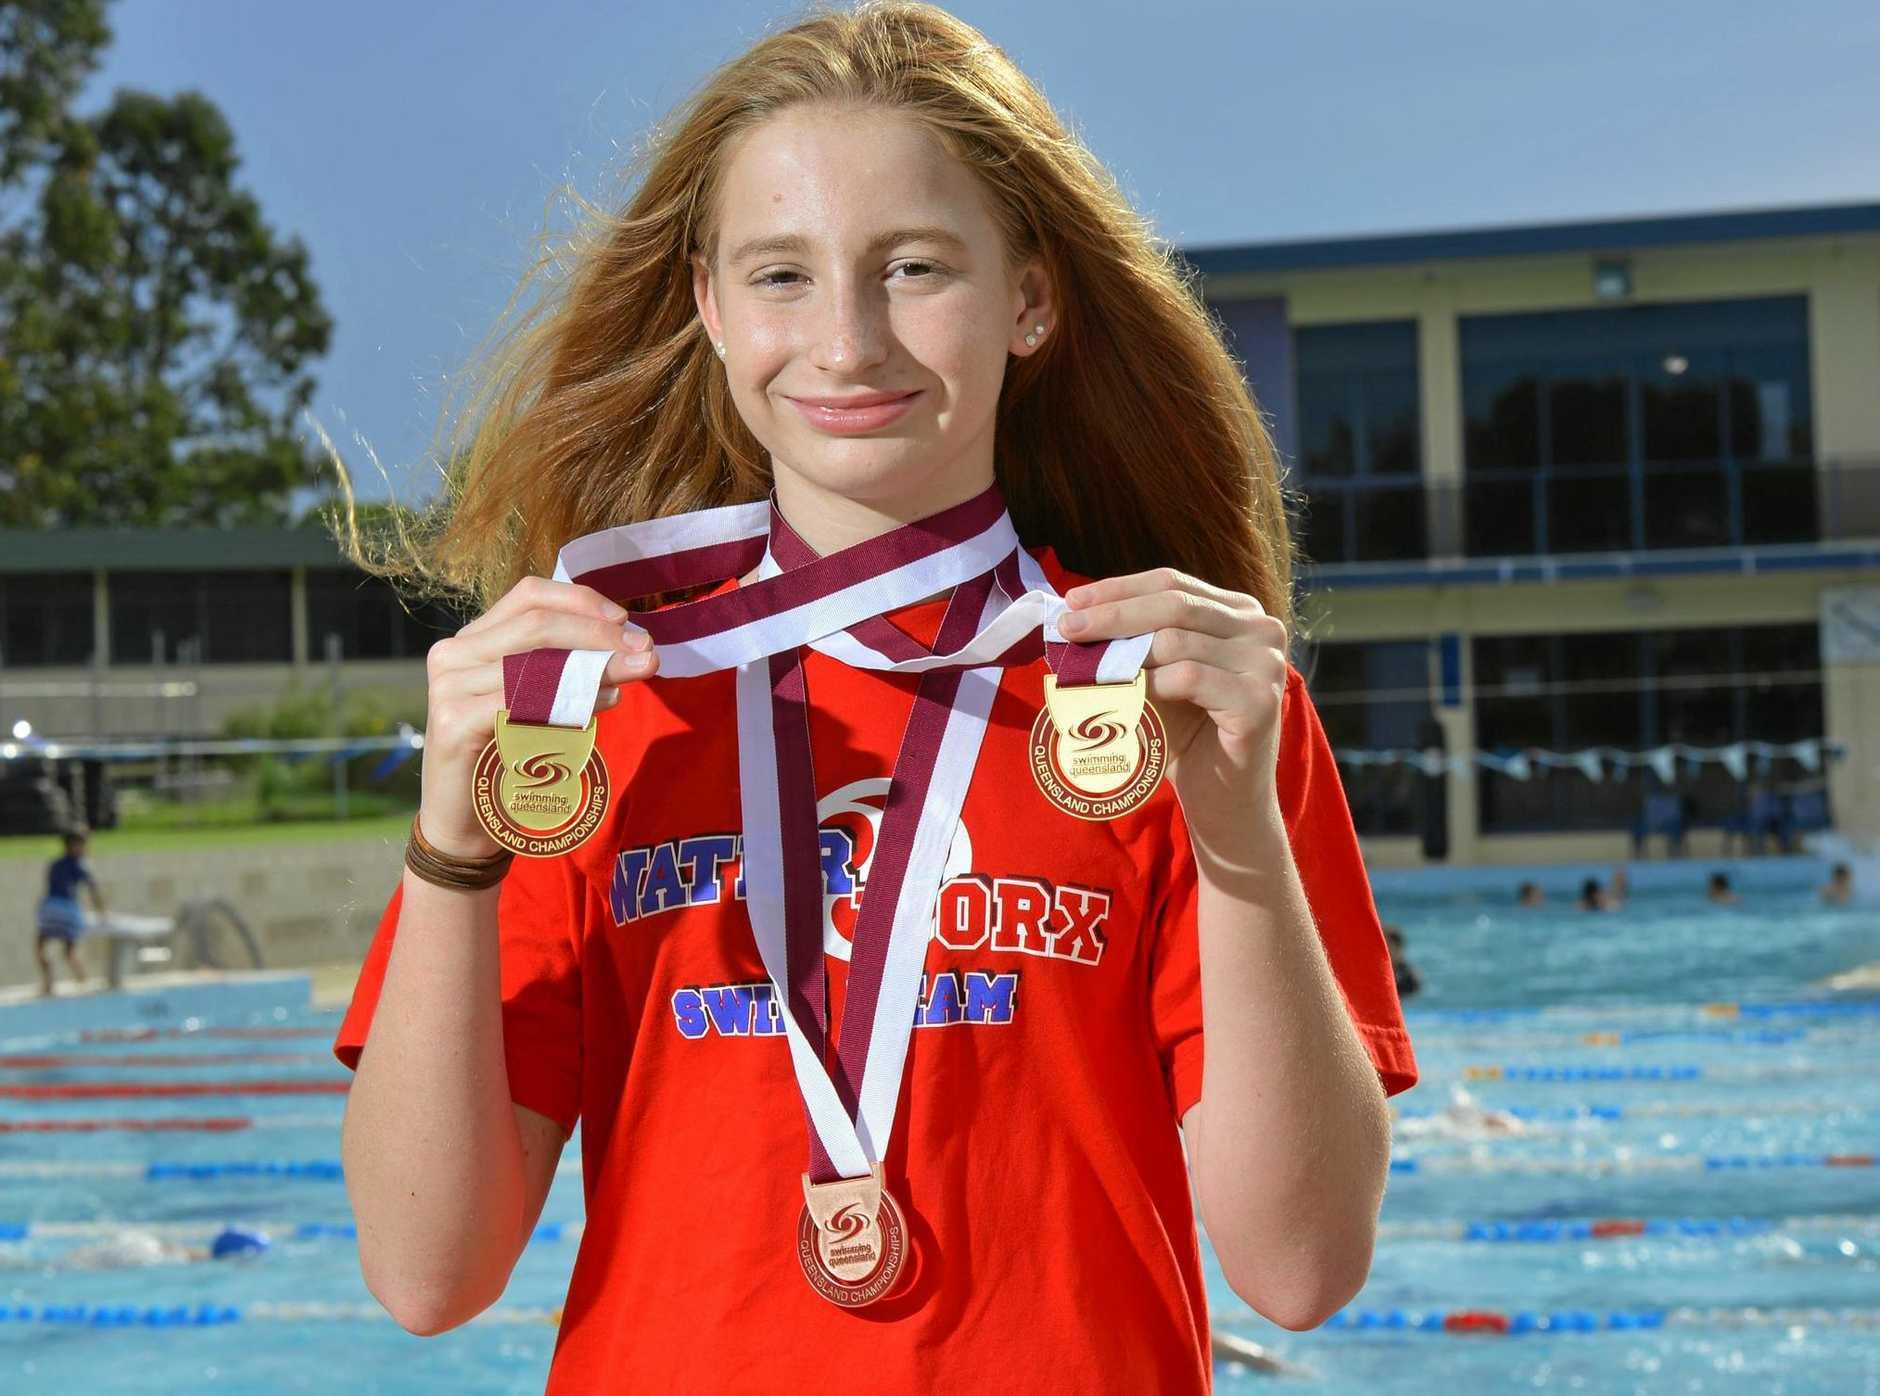 Waterworx Swim Club record-breaker Mollie O'Callaghan